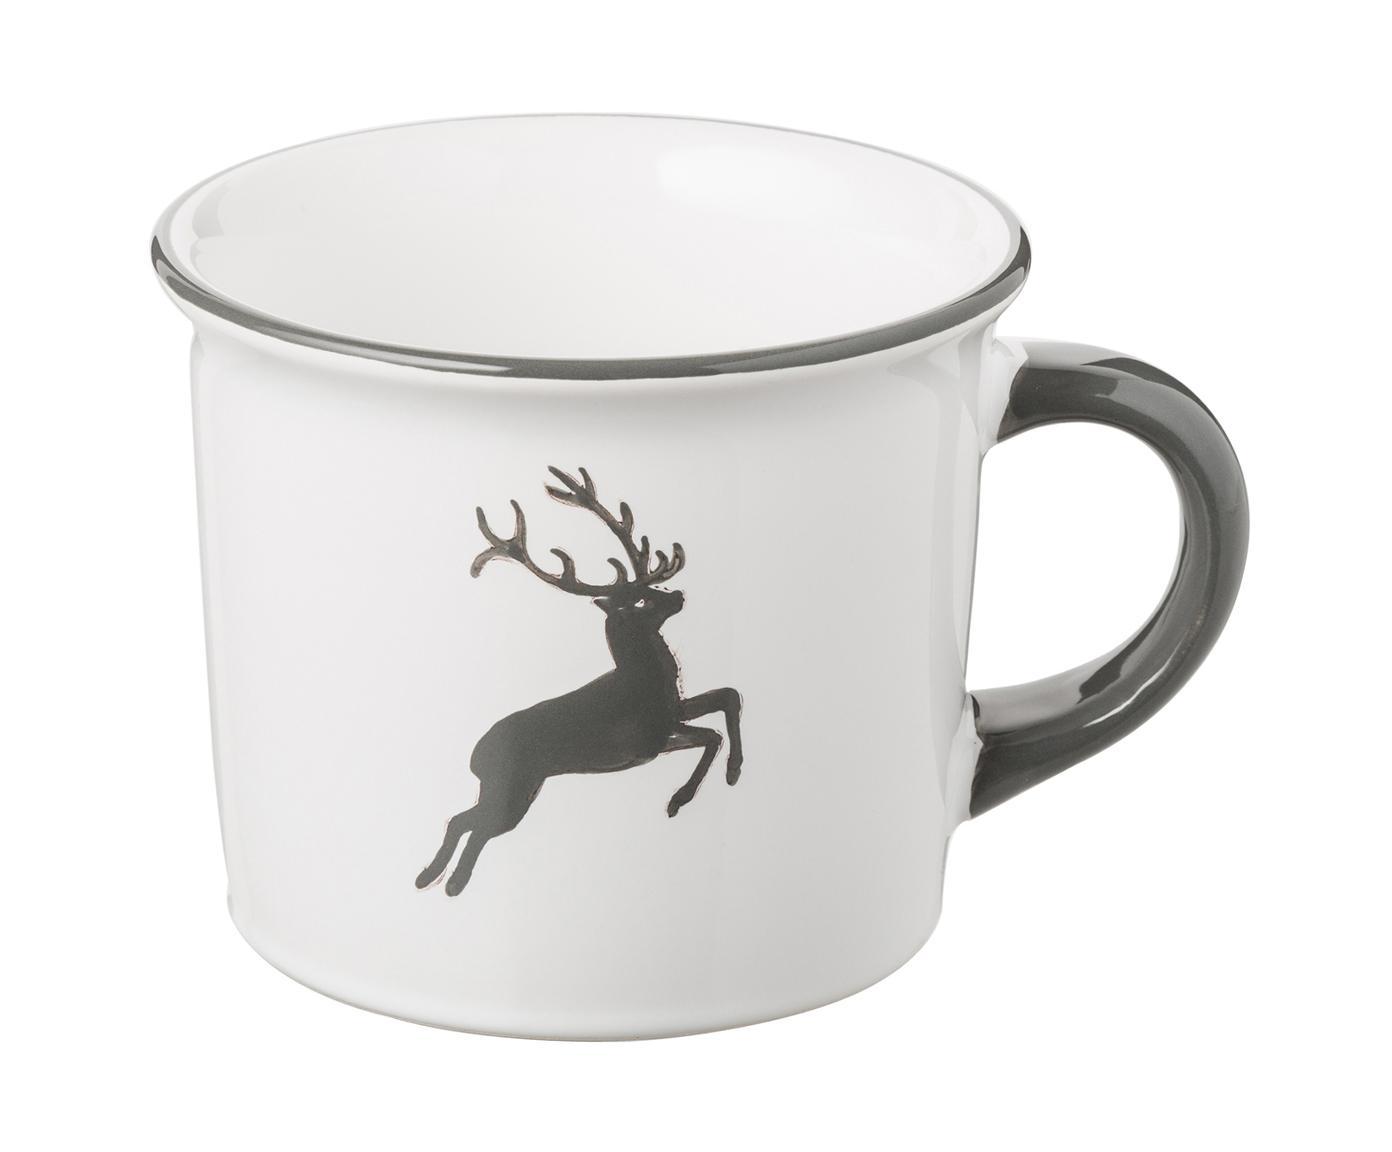 Koffiemok Classic Grey Deer, Keramiek, Grijs, wit, 240 ml